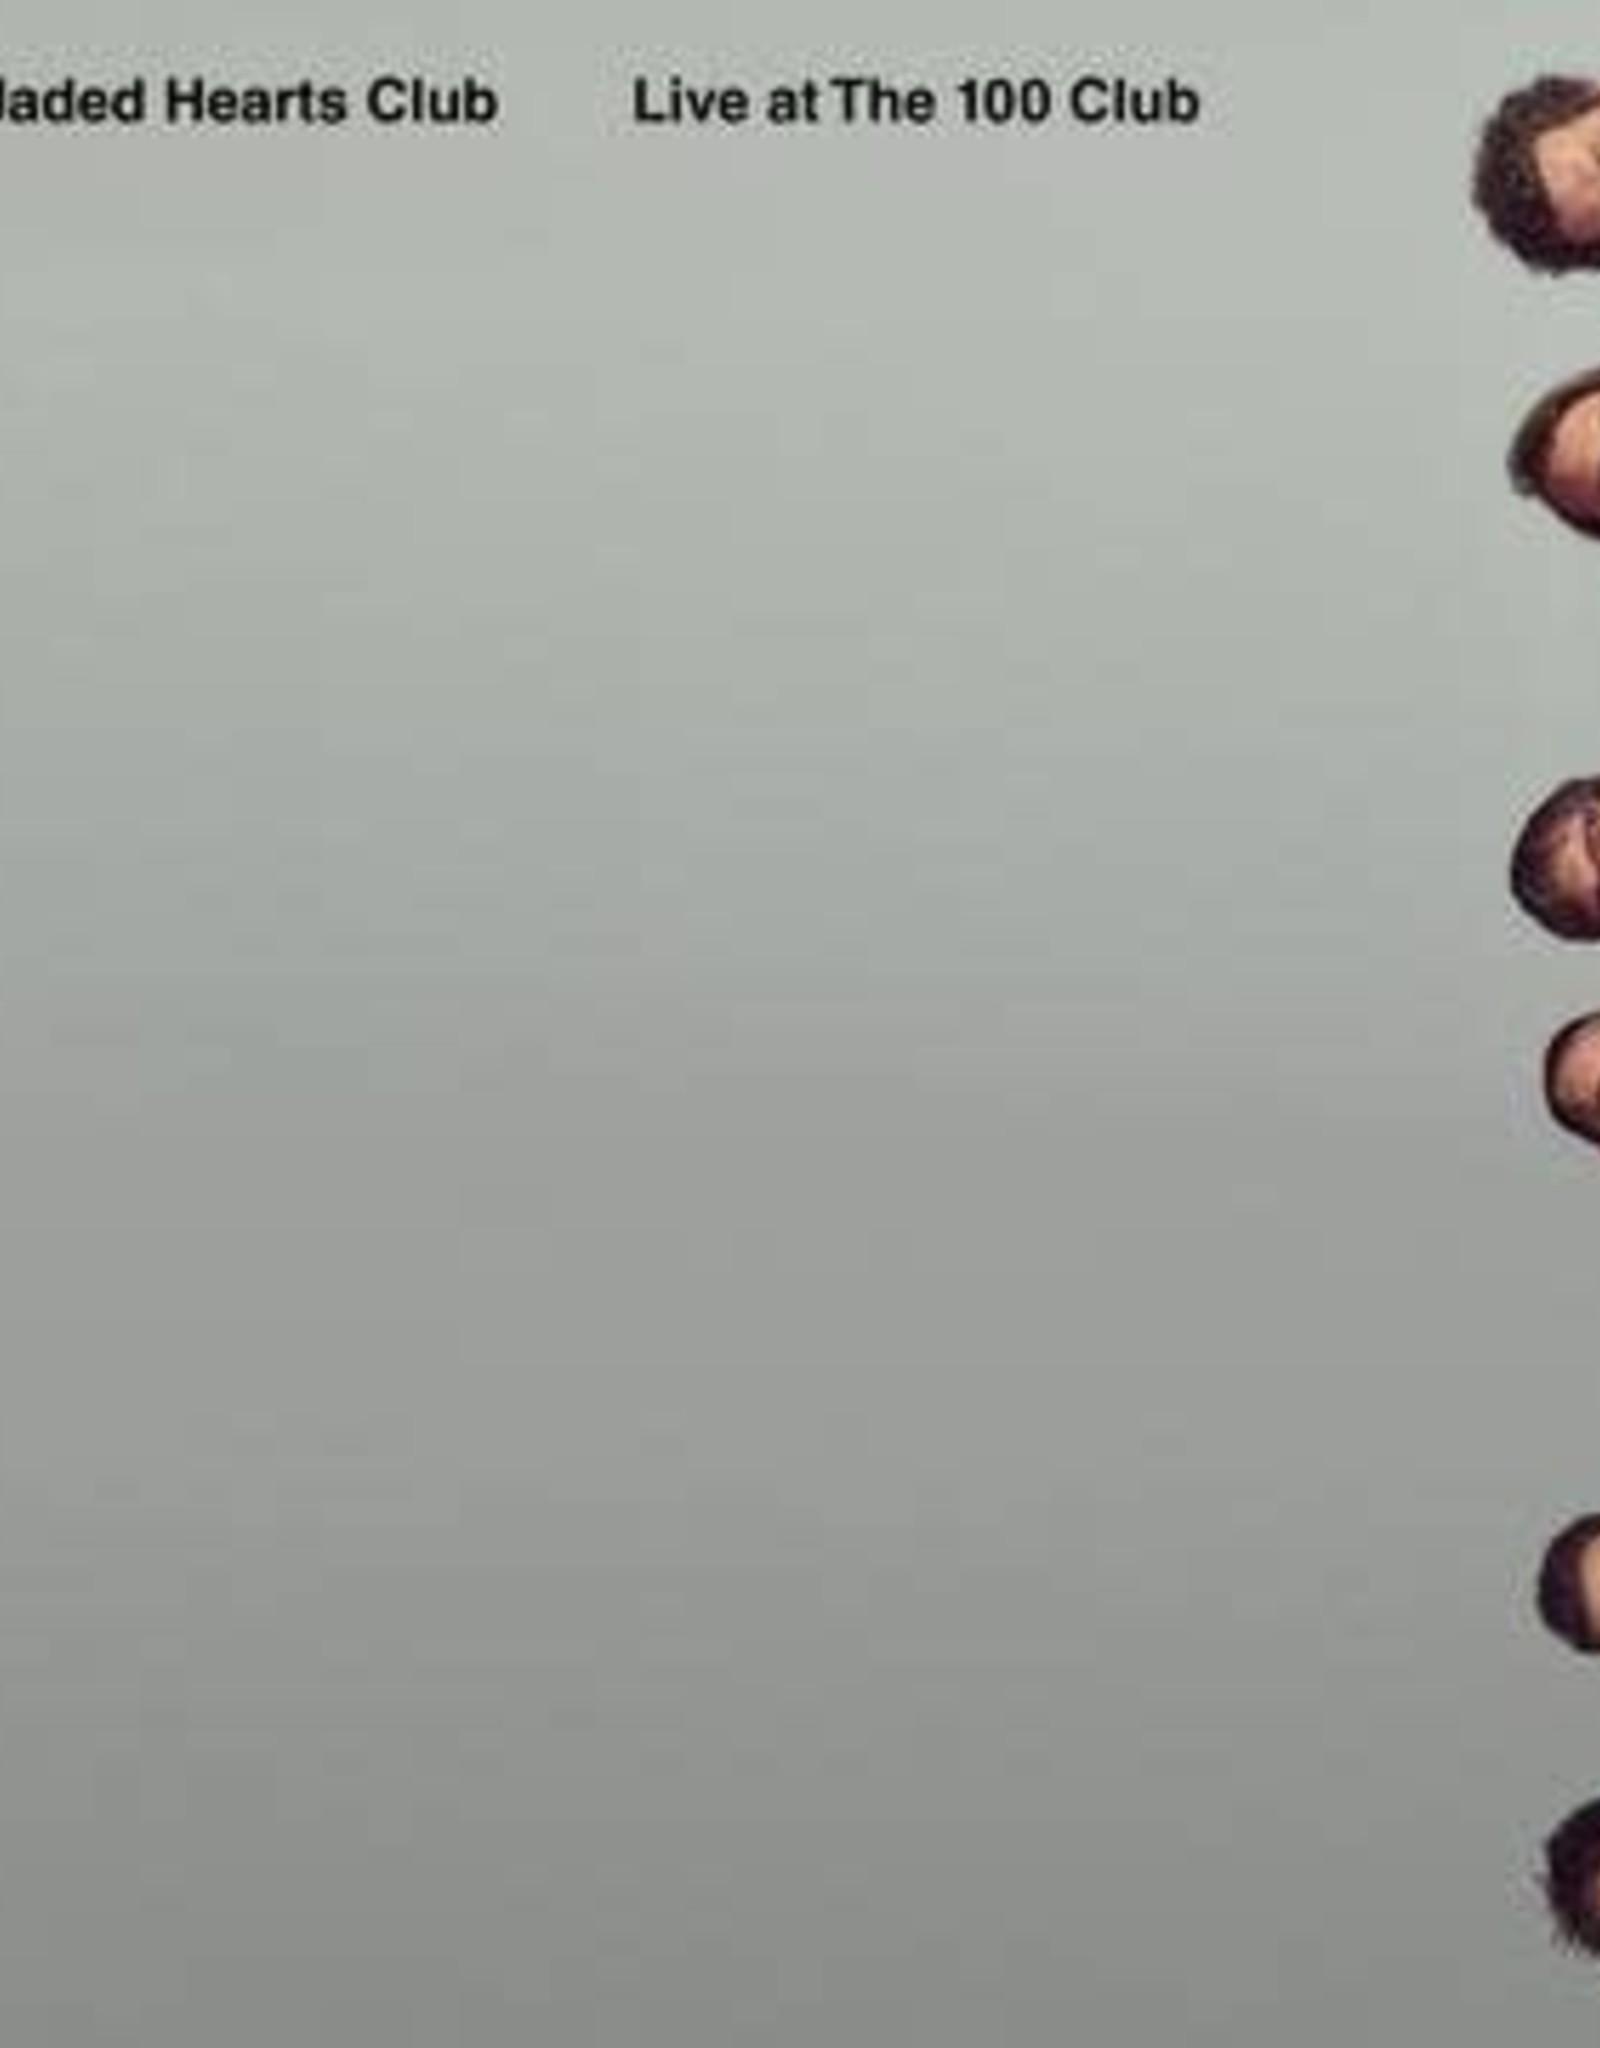 Jaded Hearts Club - Live At The 100 Club (RSD 6/21)